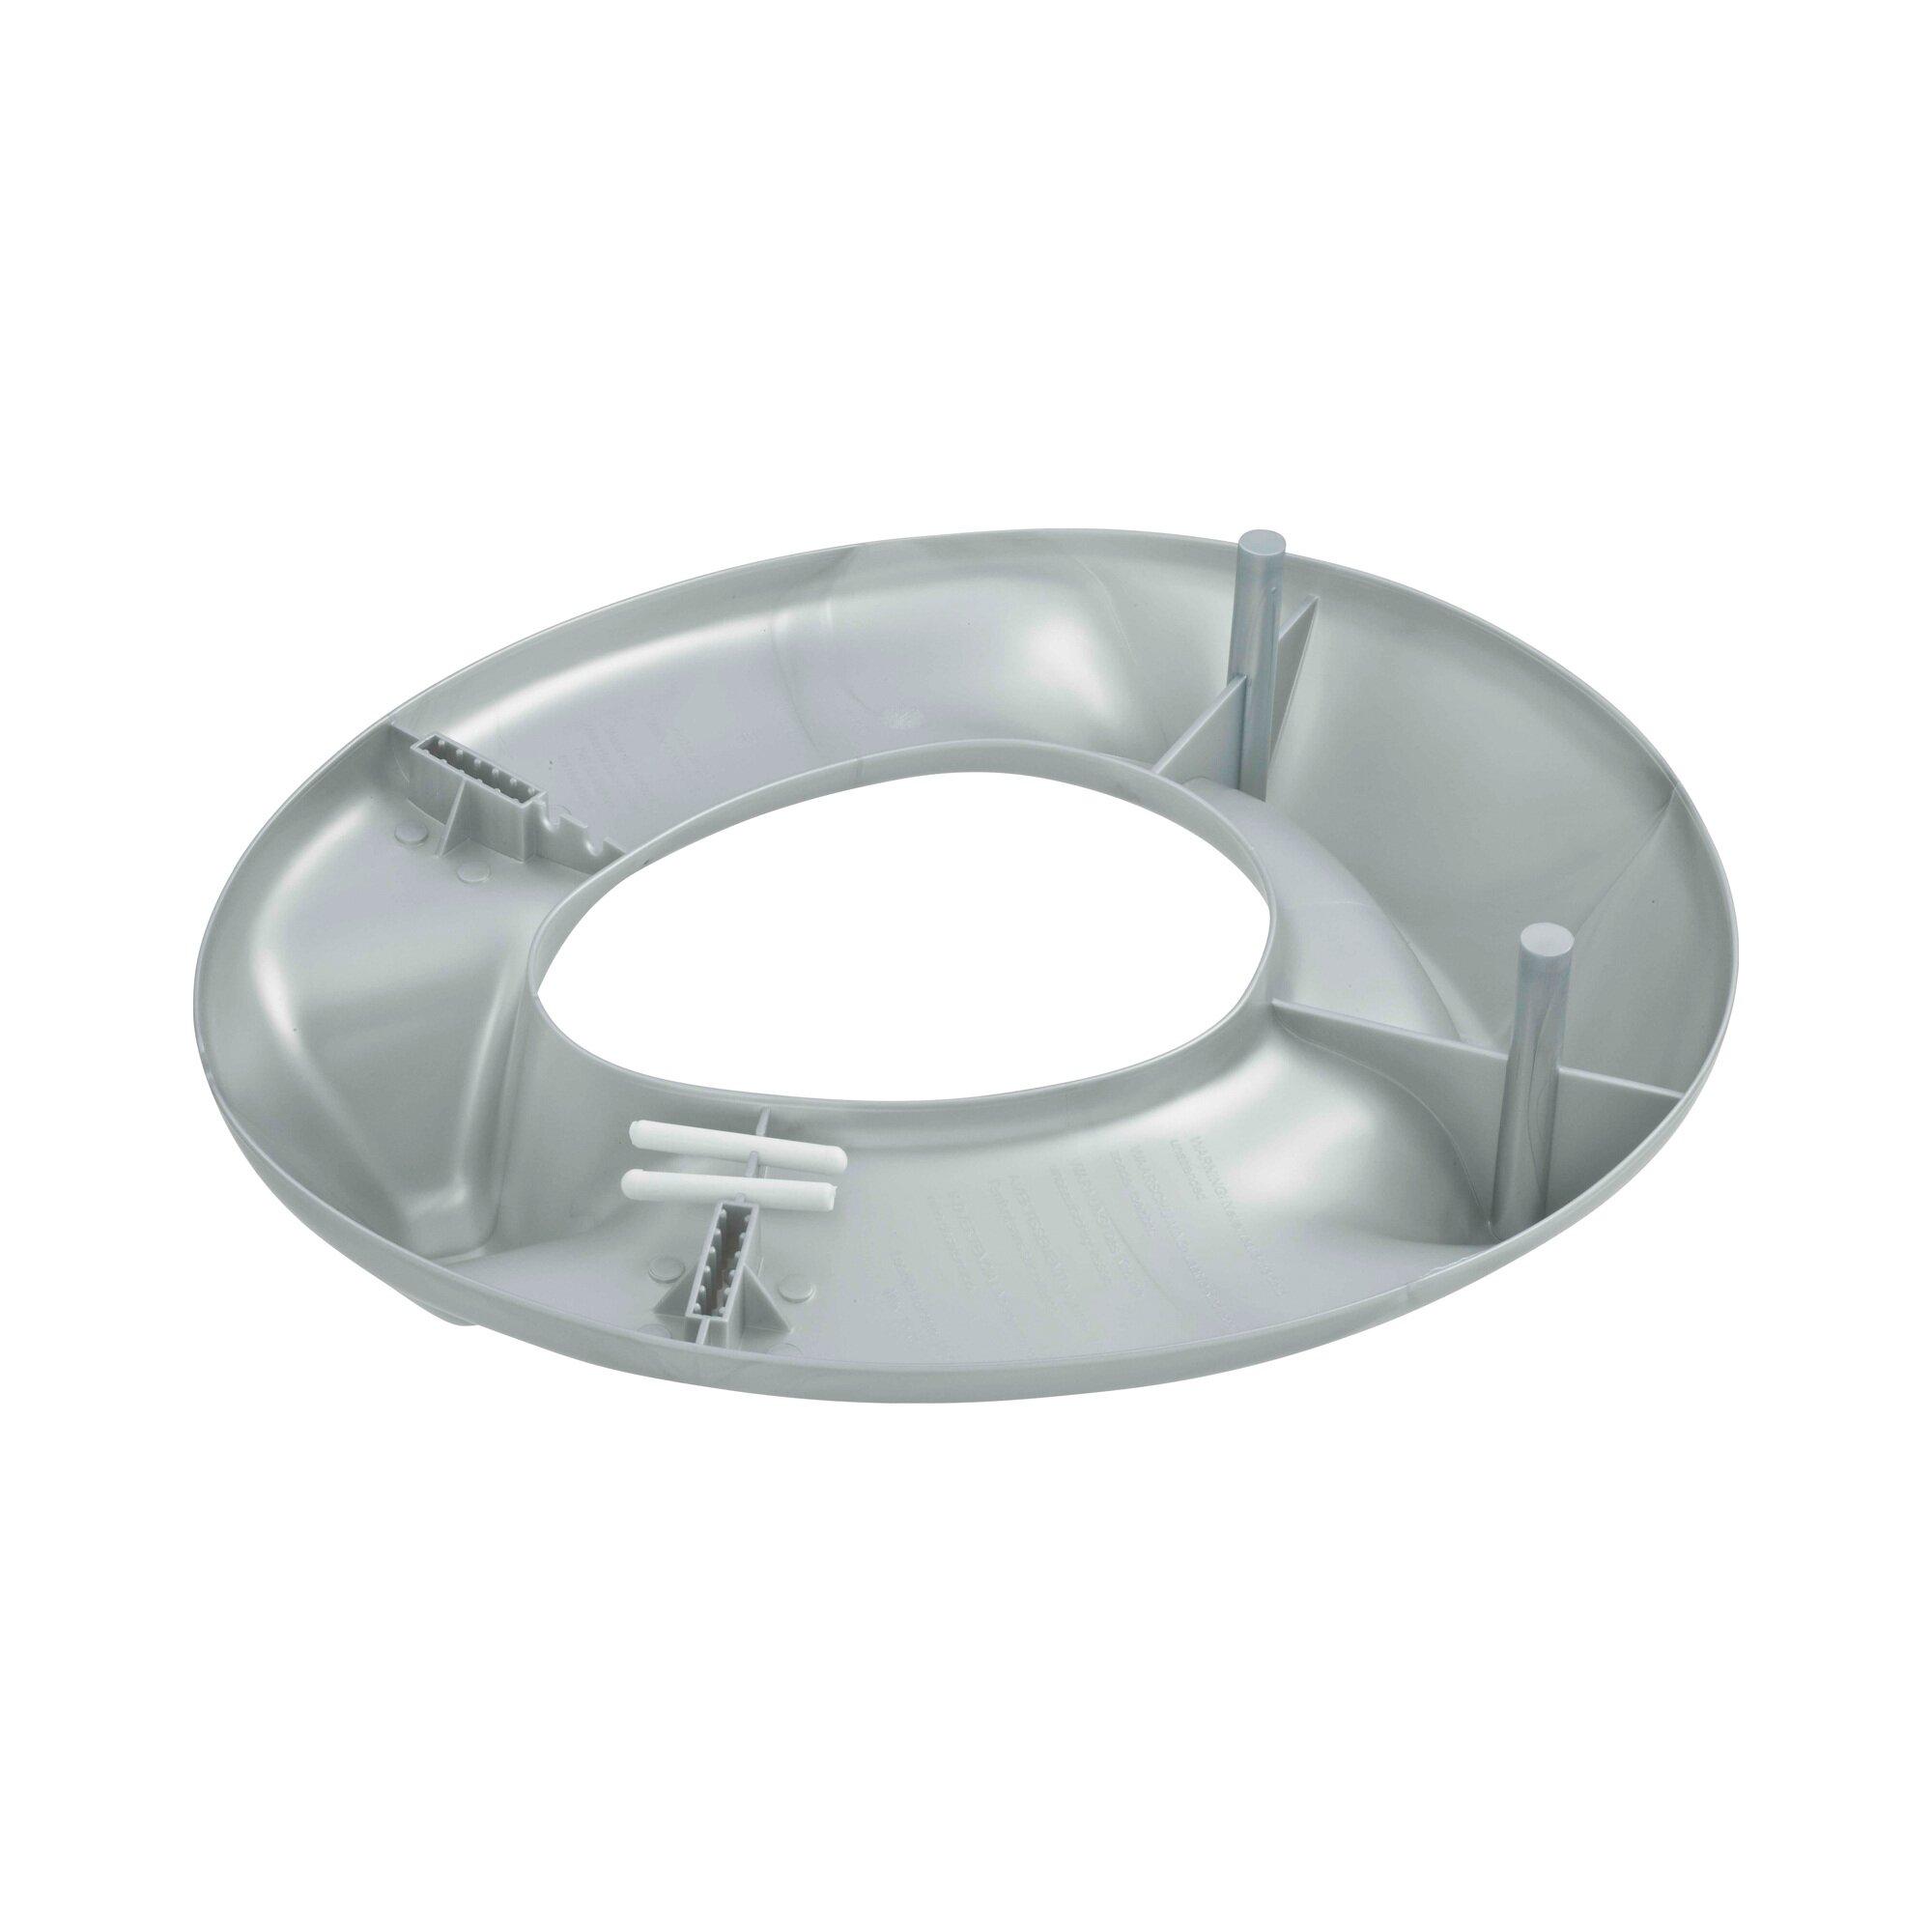 bebe-jou-toilettensitz-silver-stars